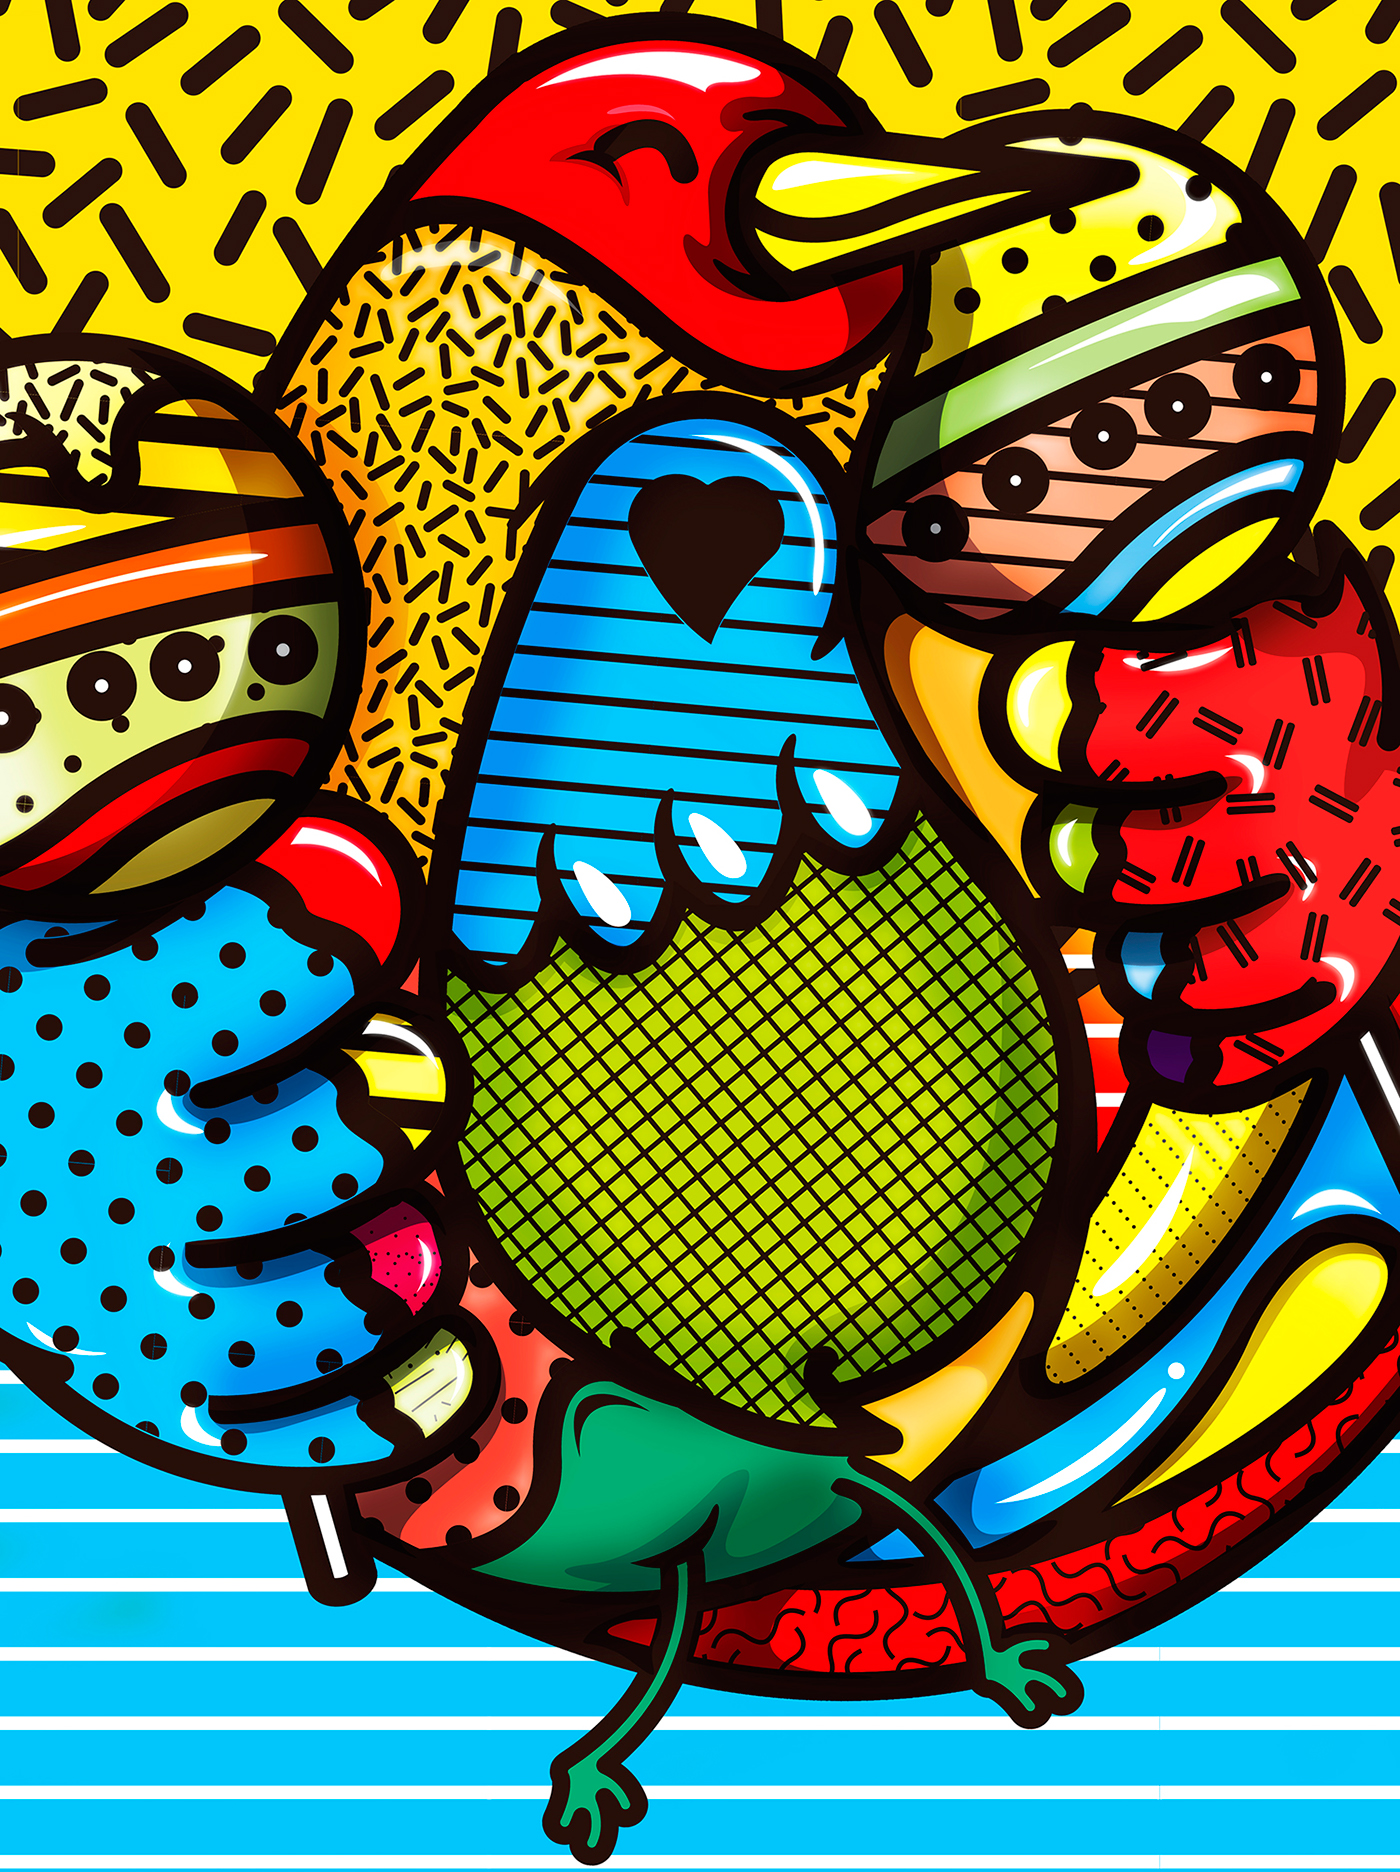 Love aves serigrafia mexico voladas rojobermelo venezuela vector artvector